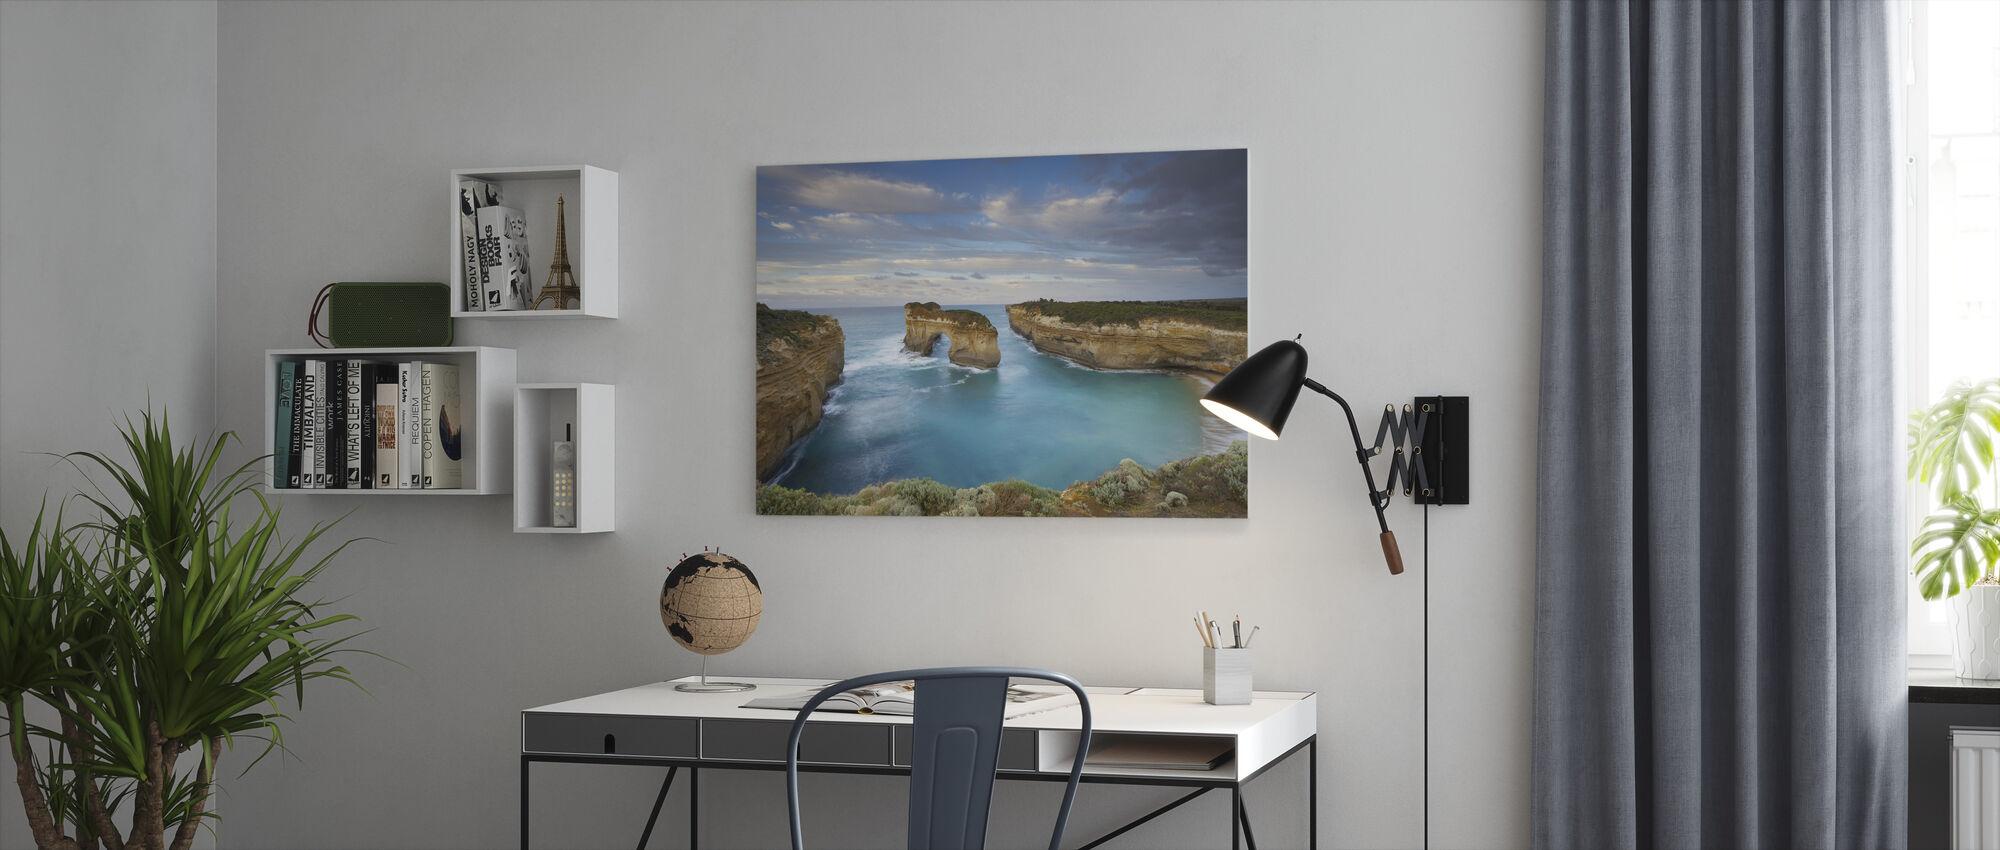 Loch Ard Gorge - Canvas print - Office